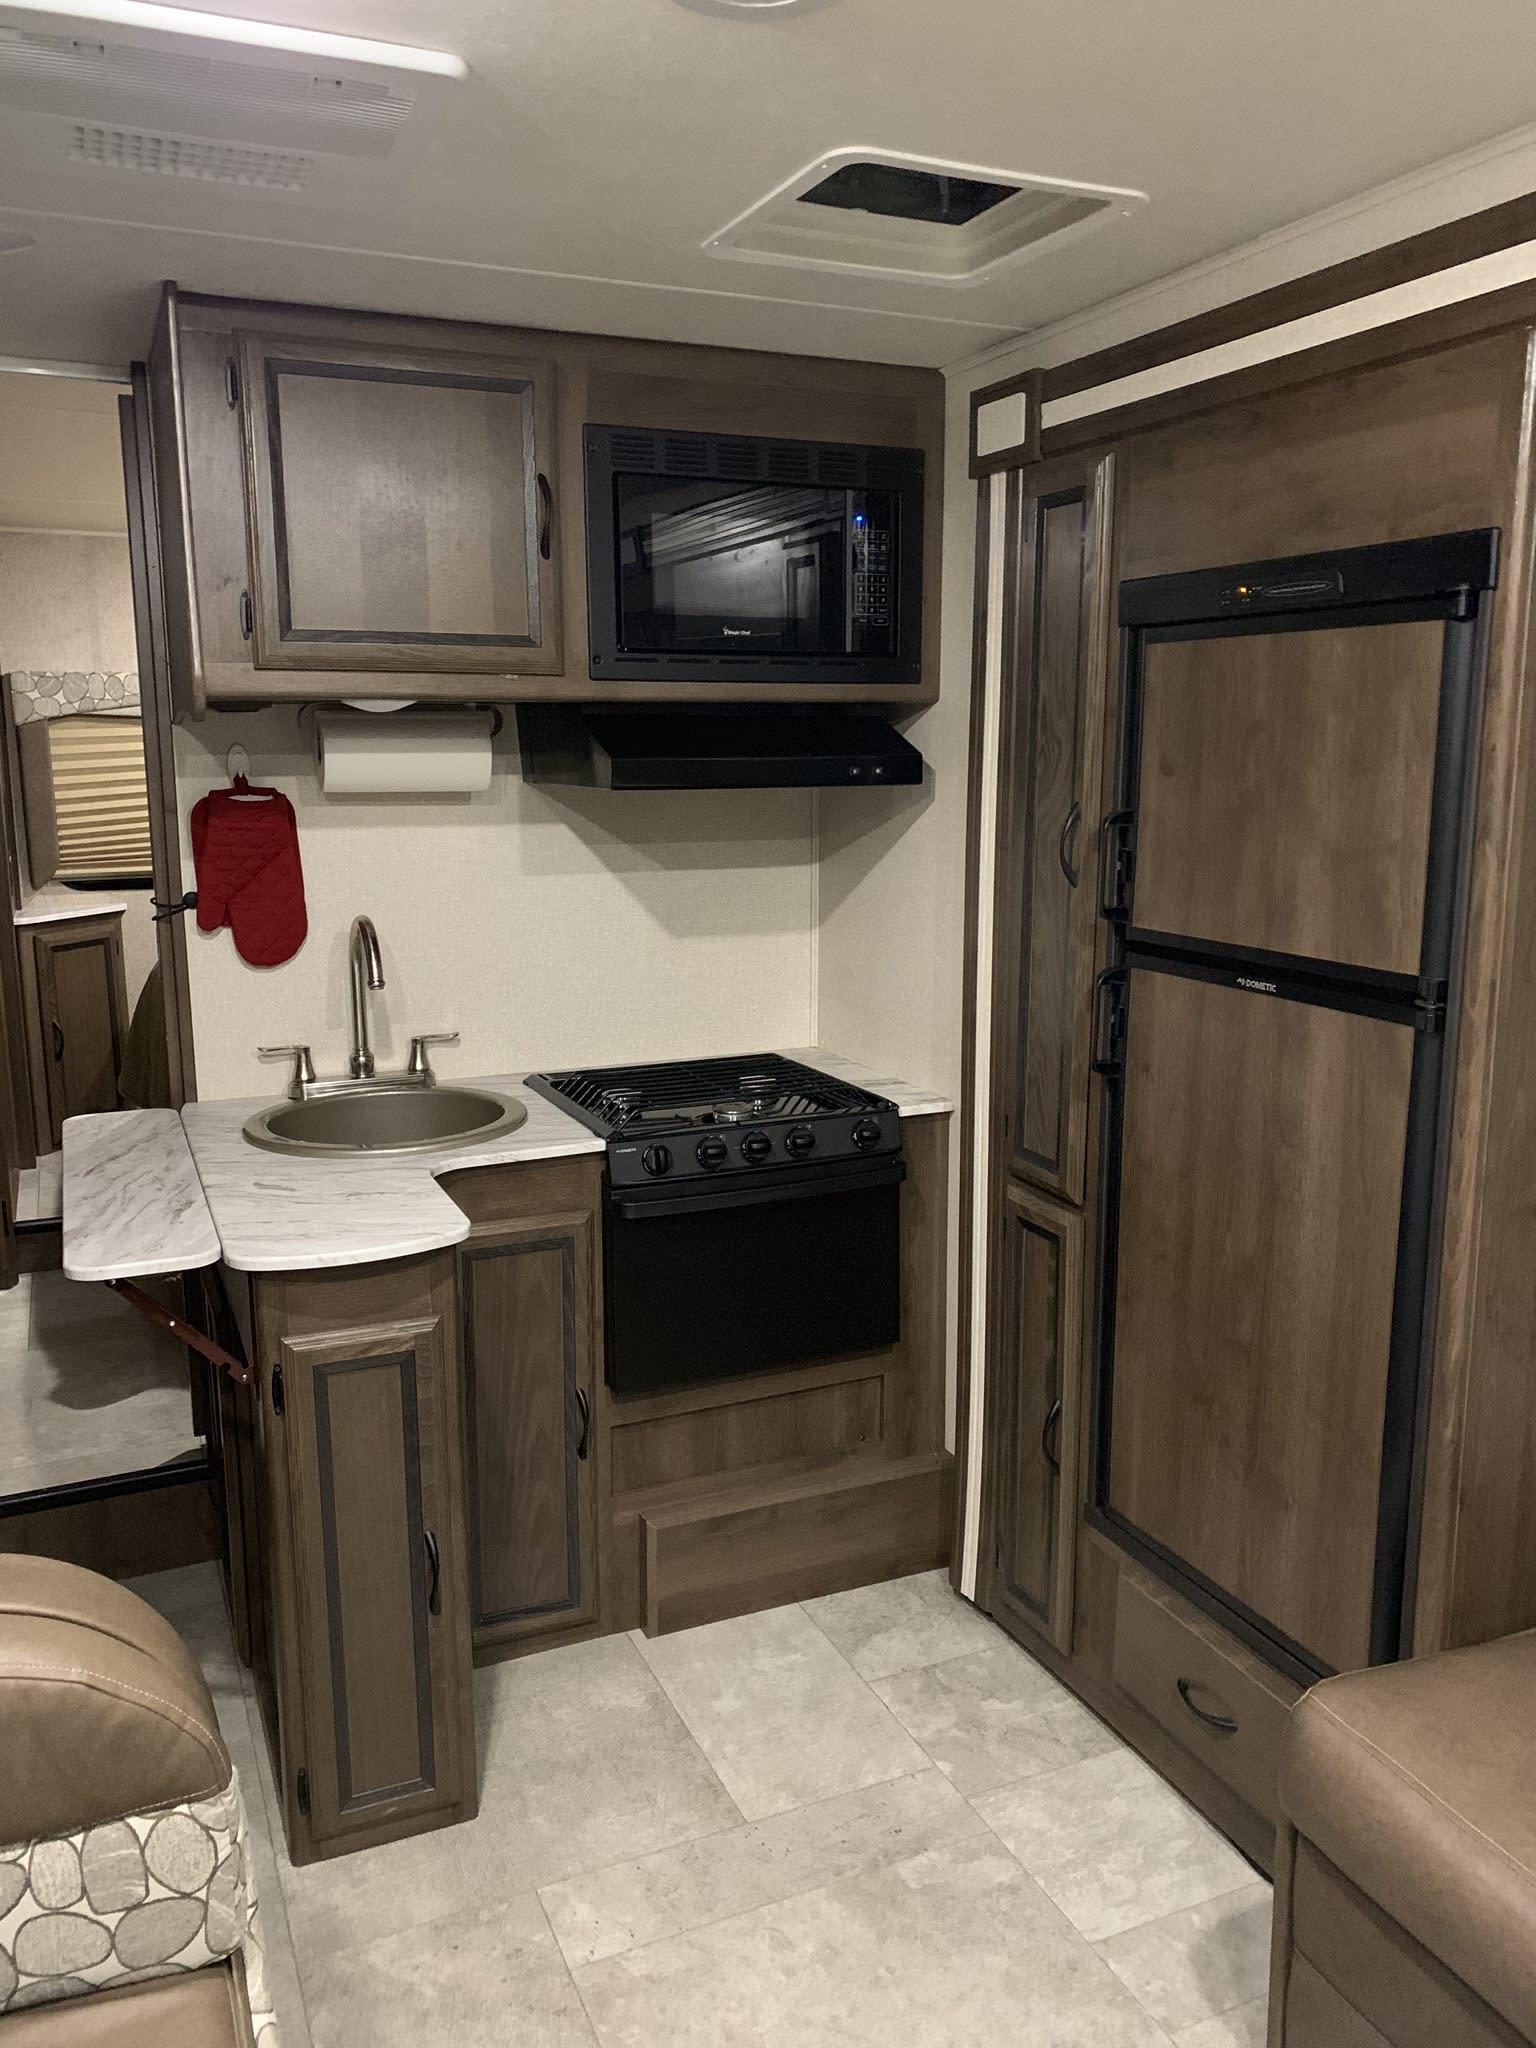 Fully furnished kitchen. Coachmen Freelander 2019